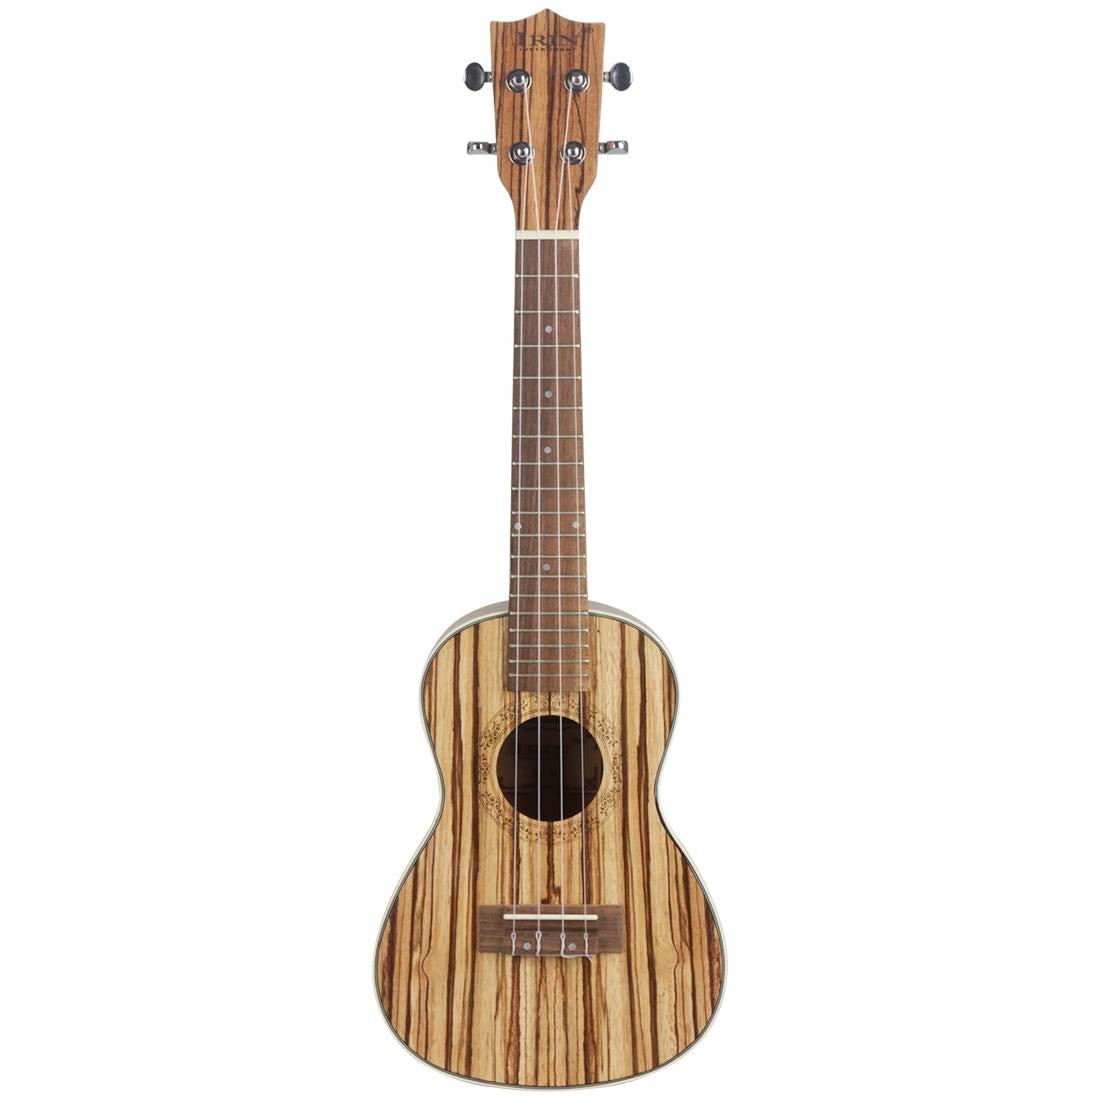 XFDZ IRIN Concert Ukulele 24 Inch 4 Strings Hawaiian Mini Guitar Acoustic Guitar Ukelele guitar send gifts Musical Stringed Ins